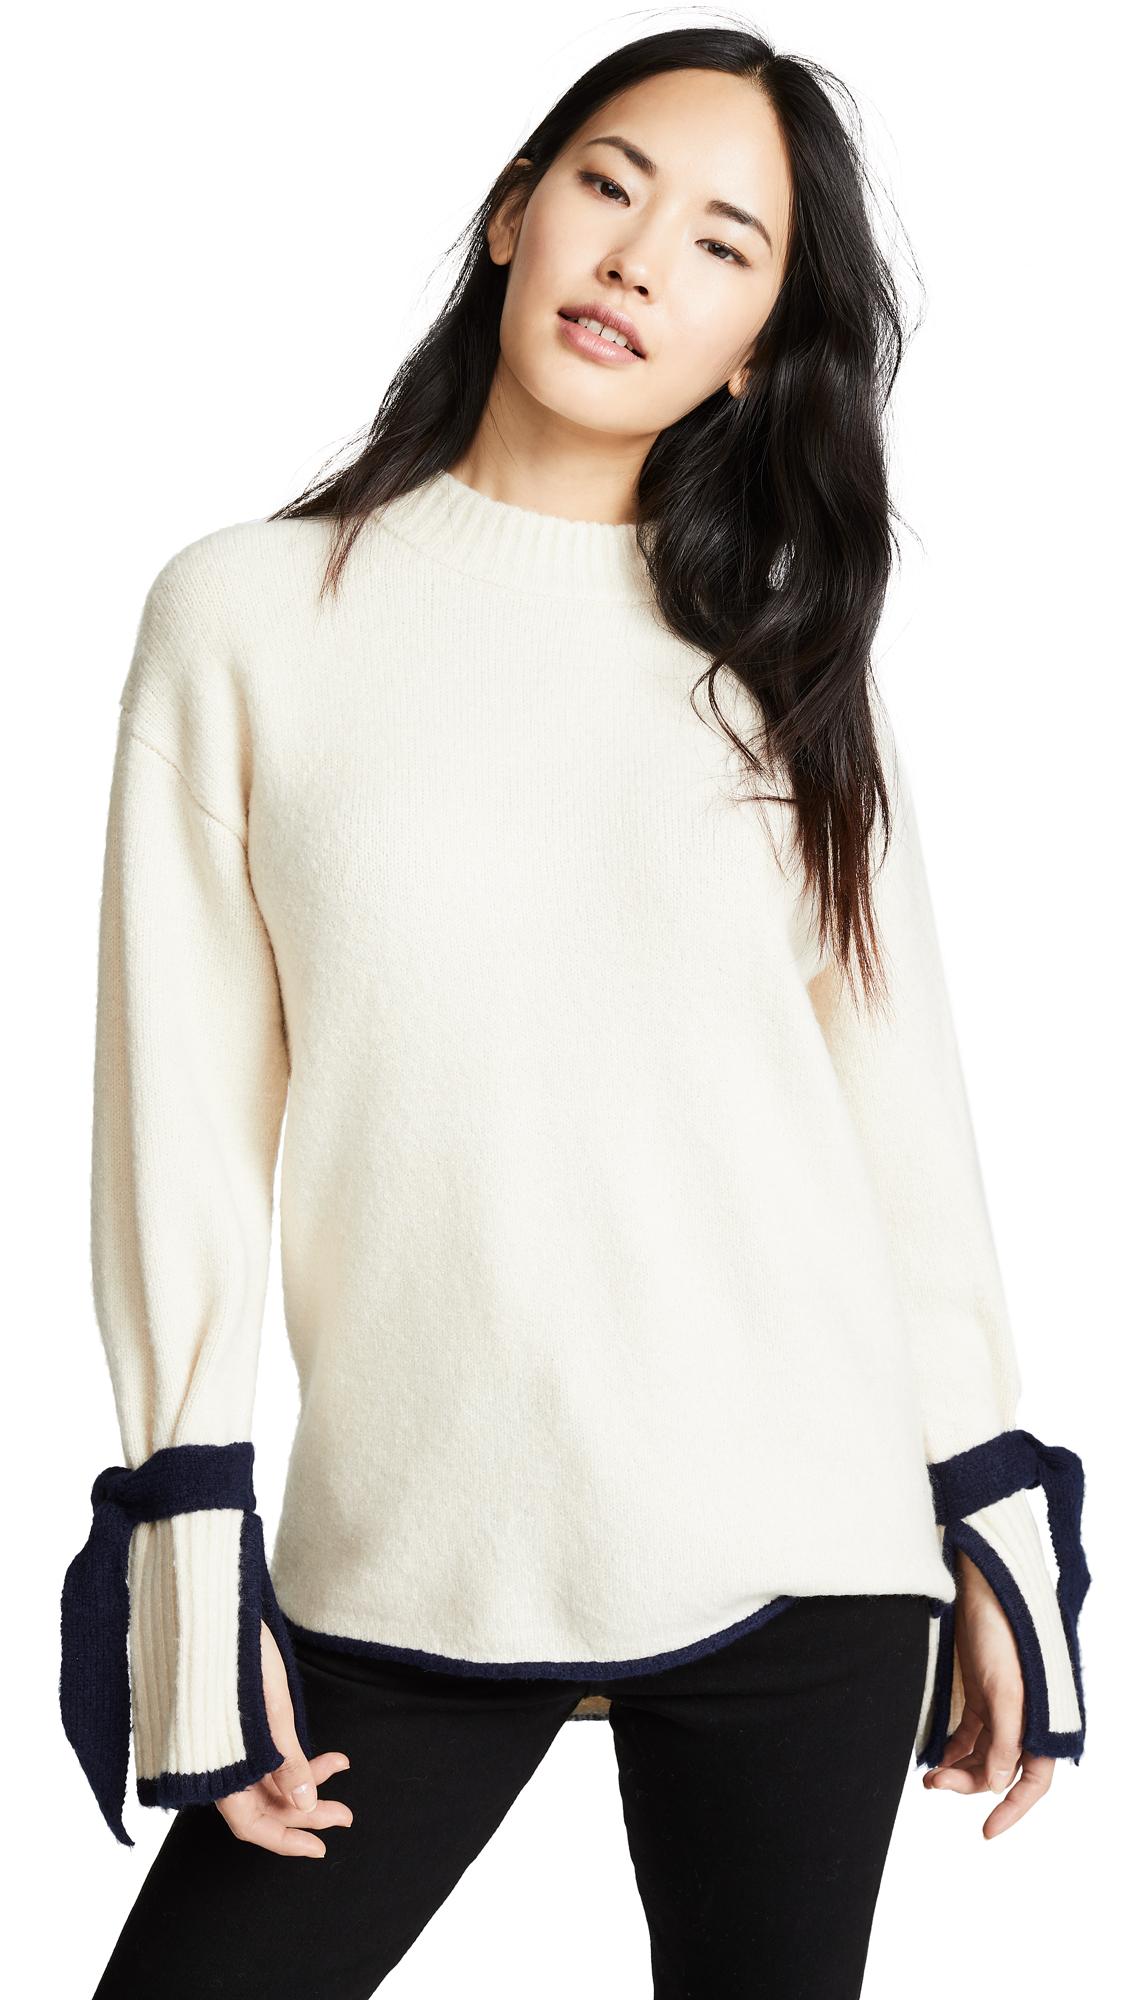 JOA Tie Sleeve Sweater in Cream